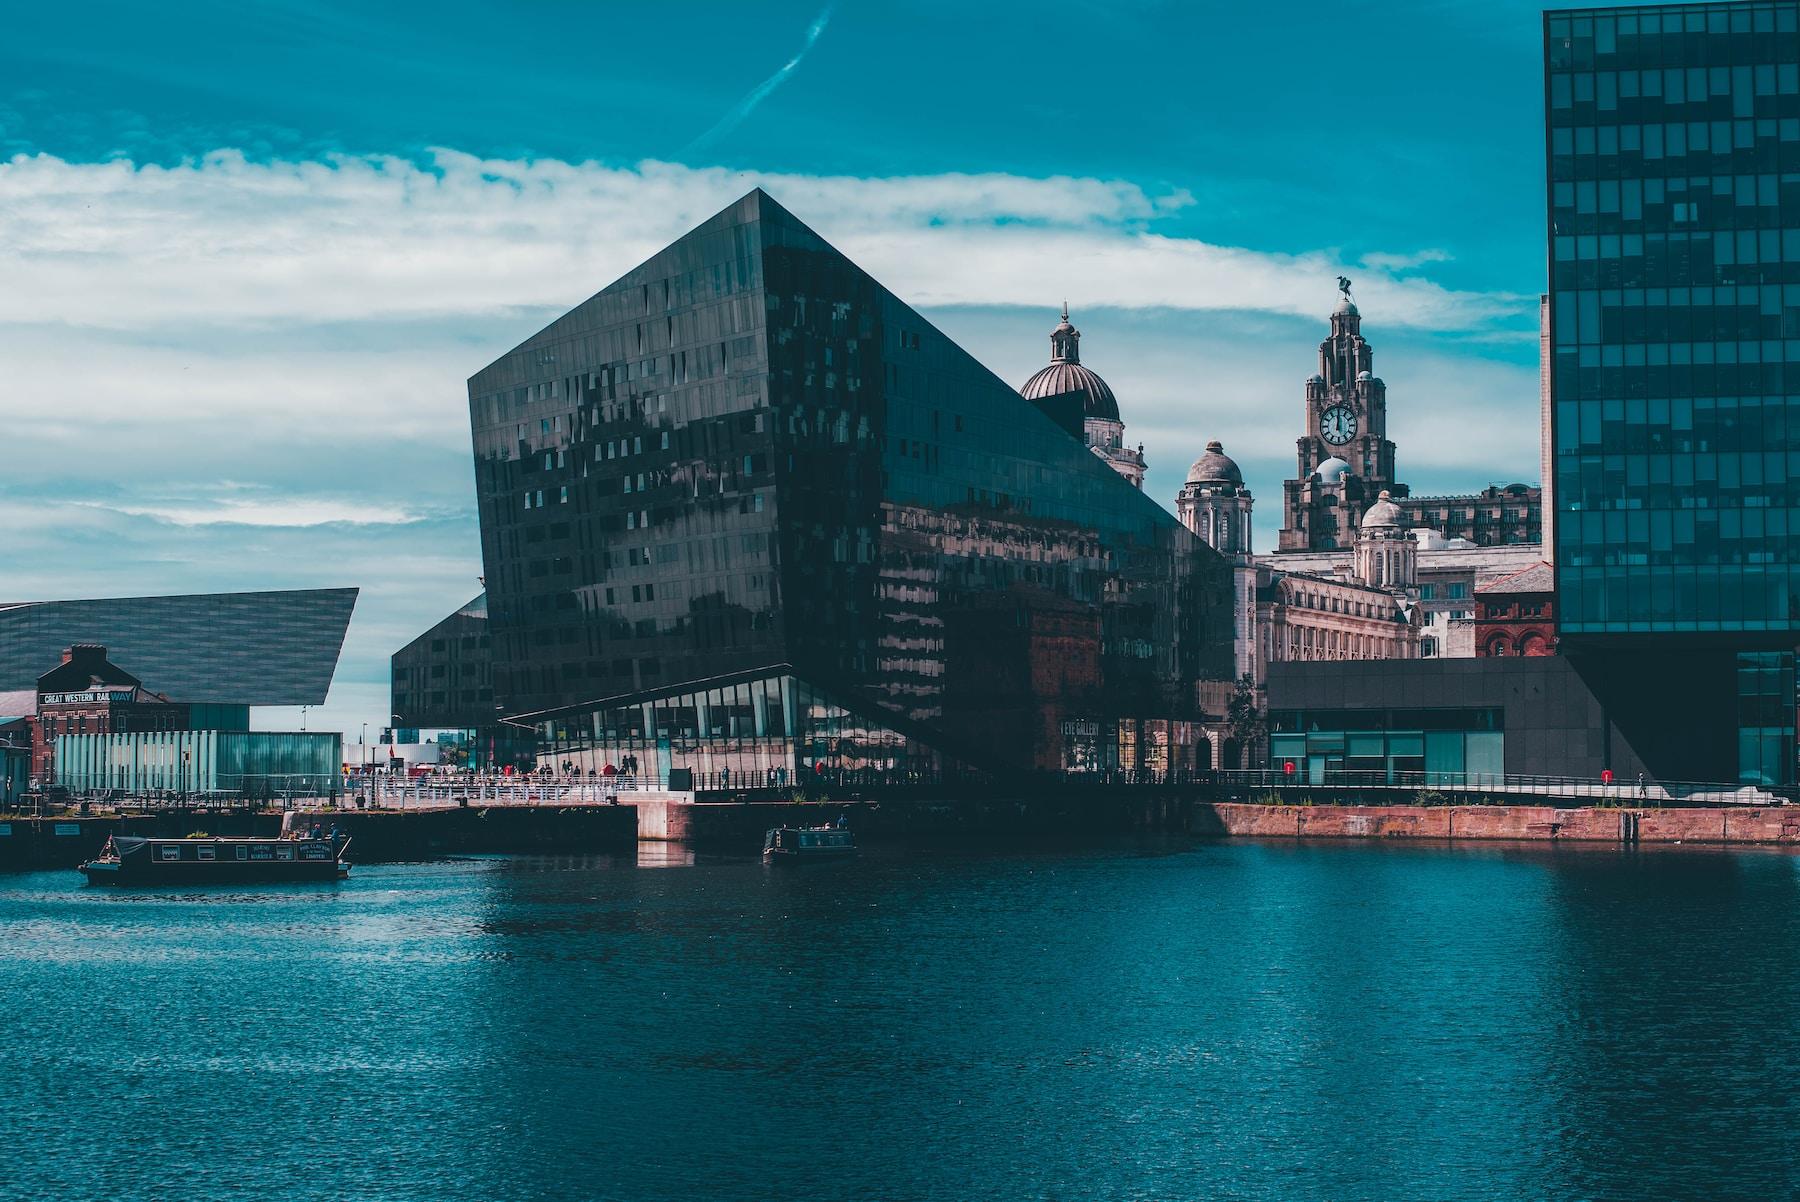 Image of Liverpool PierHead by Marcus Cramer on Unsplash